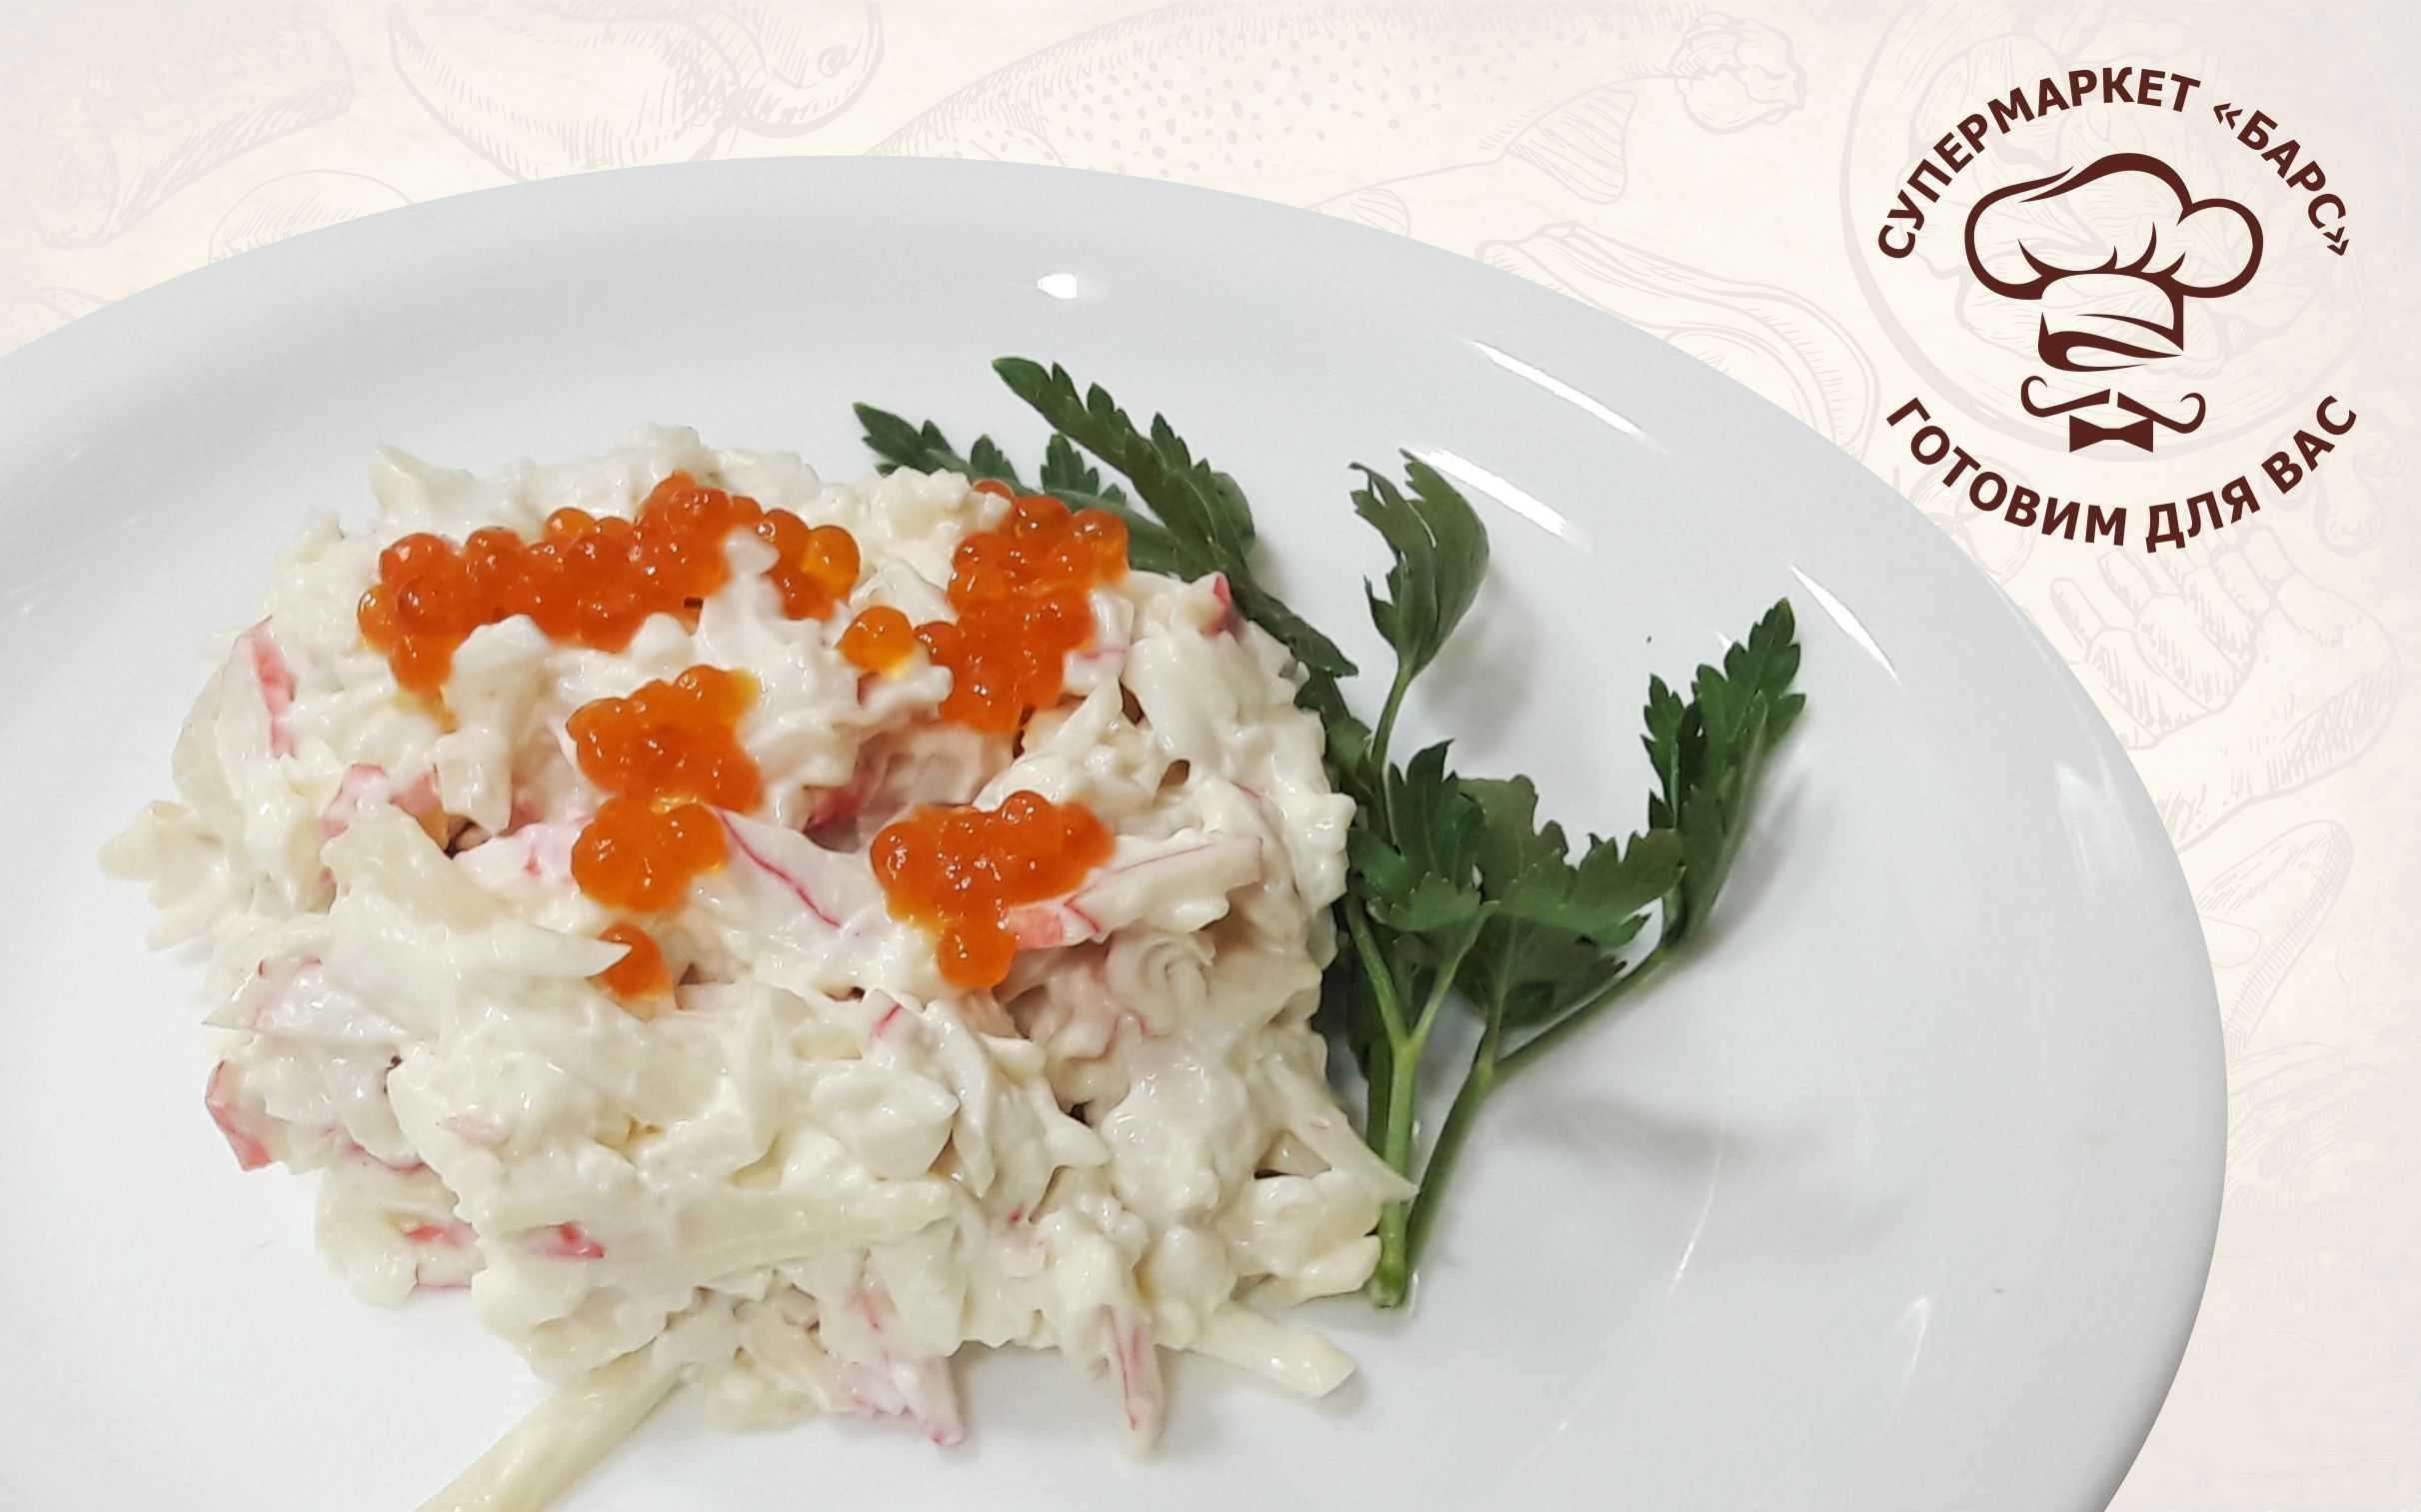 Кремлевская хряпа закуска капустная